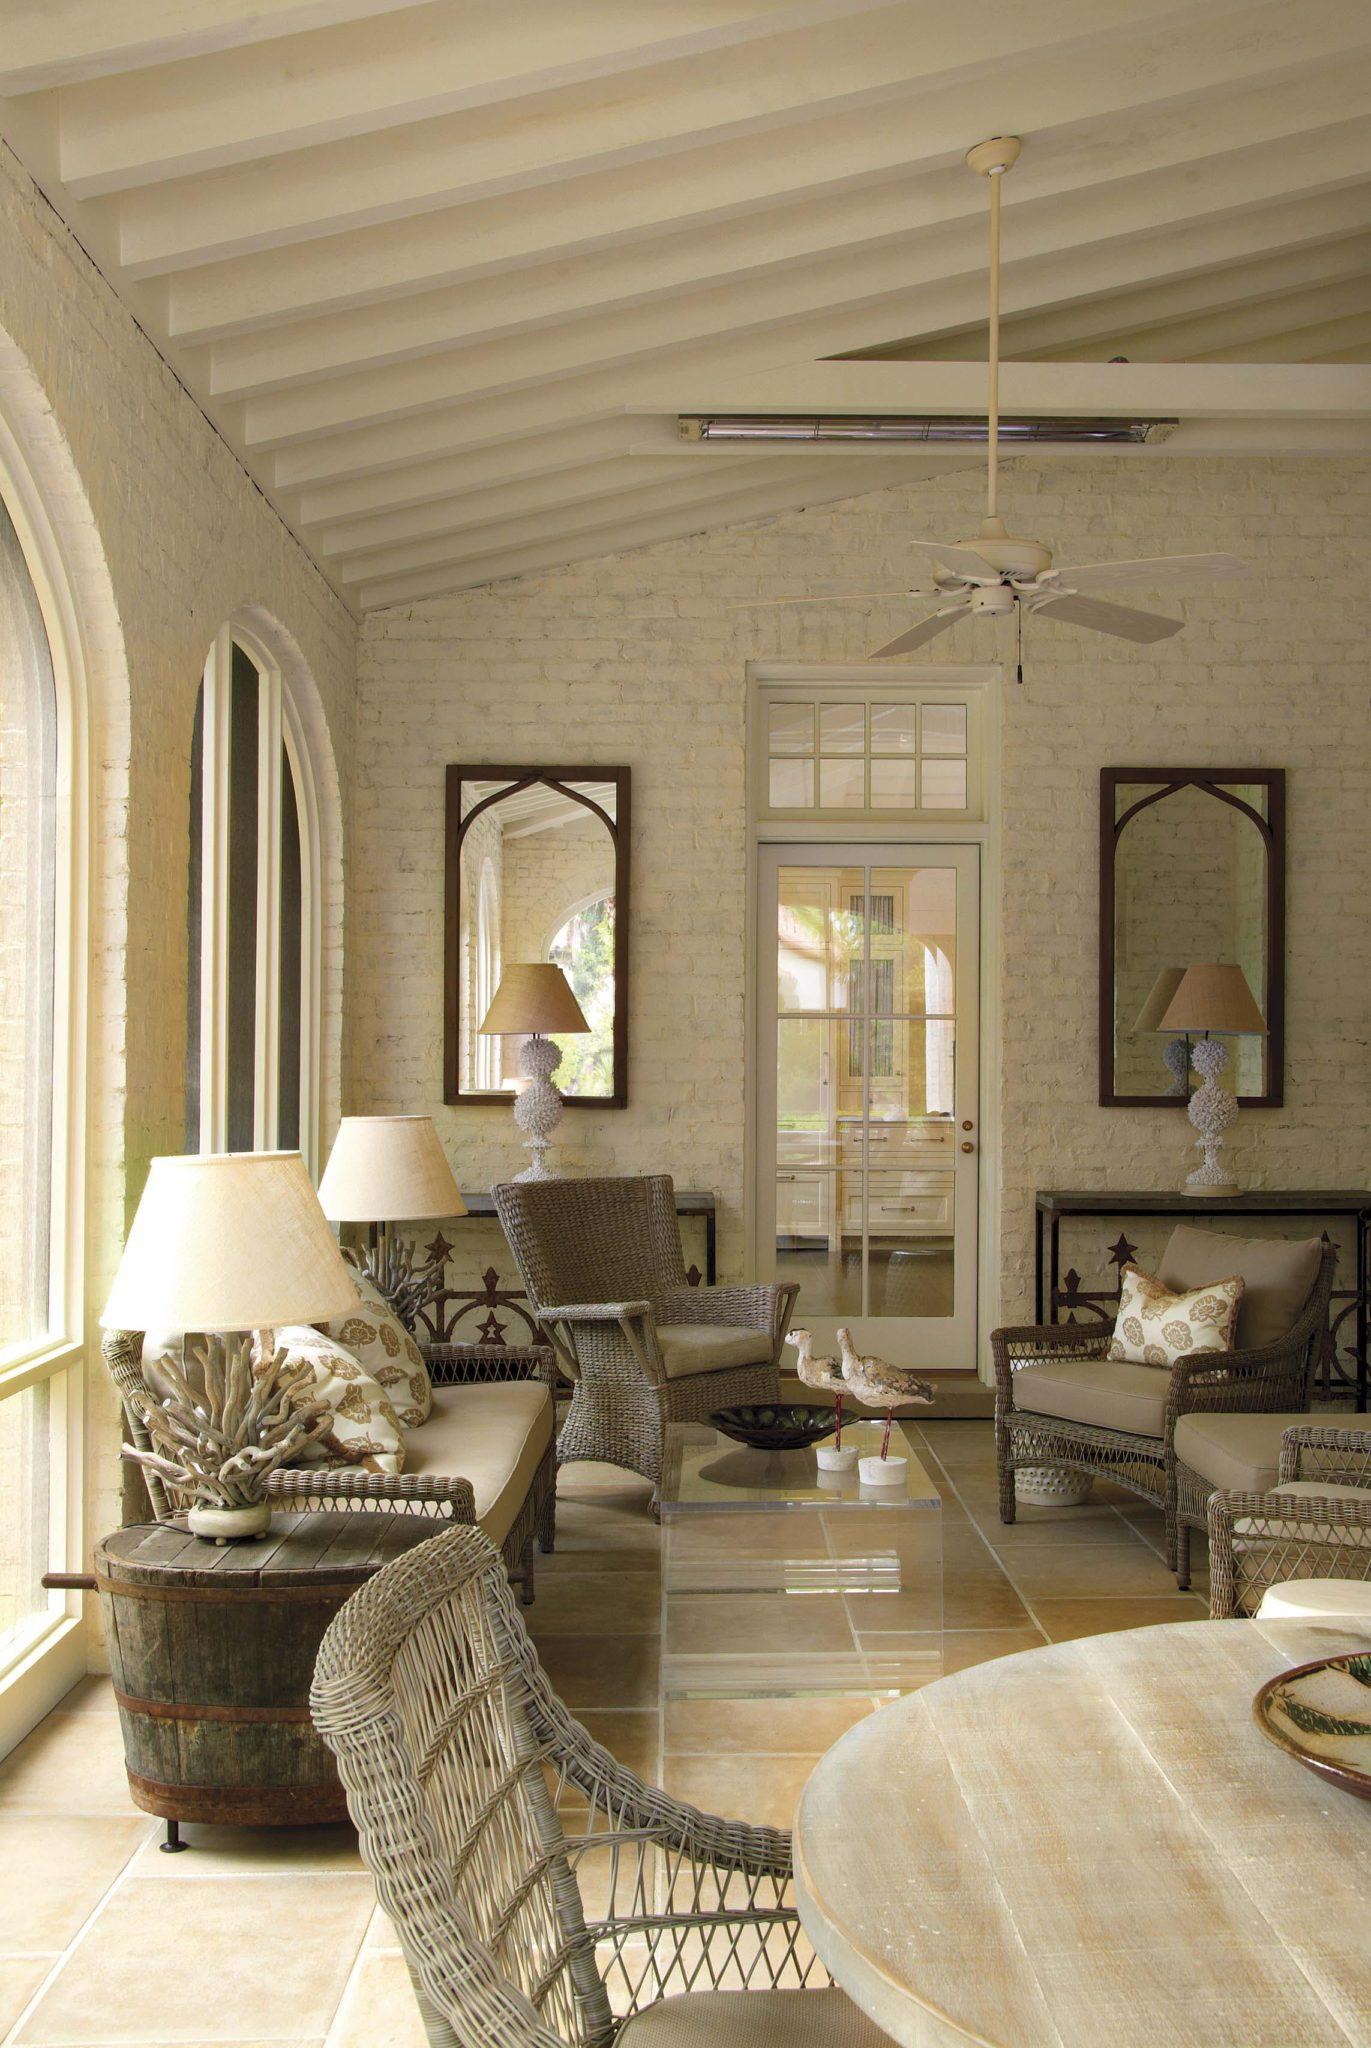 Interior design by Susan B. Bozeman Designs